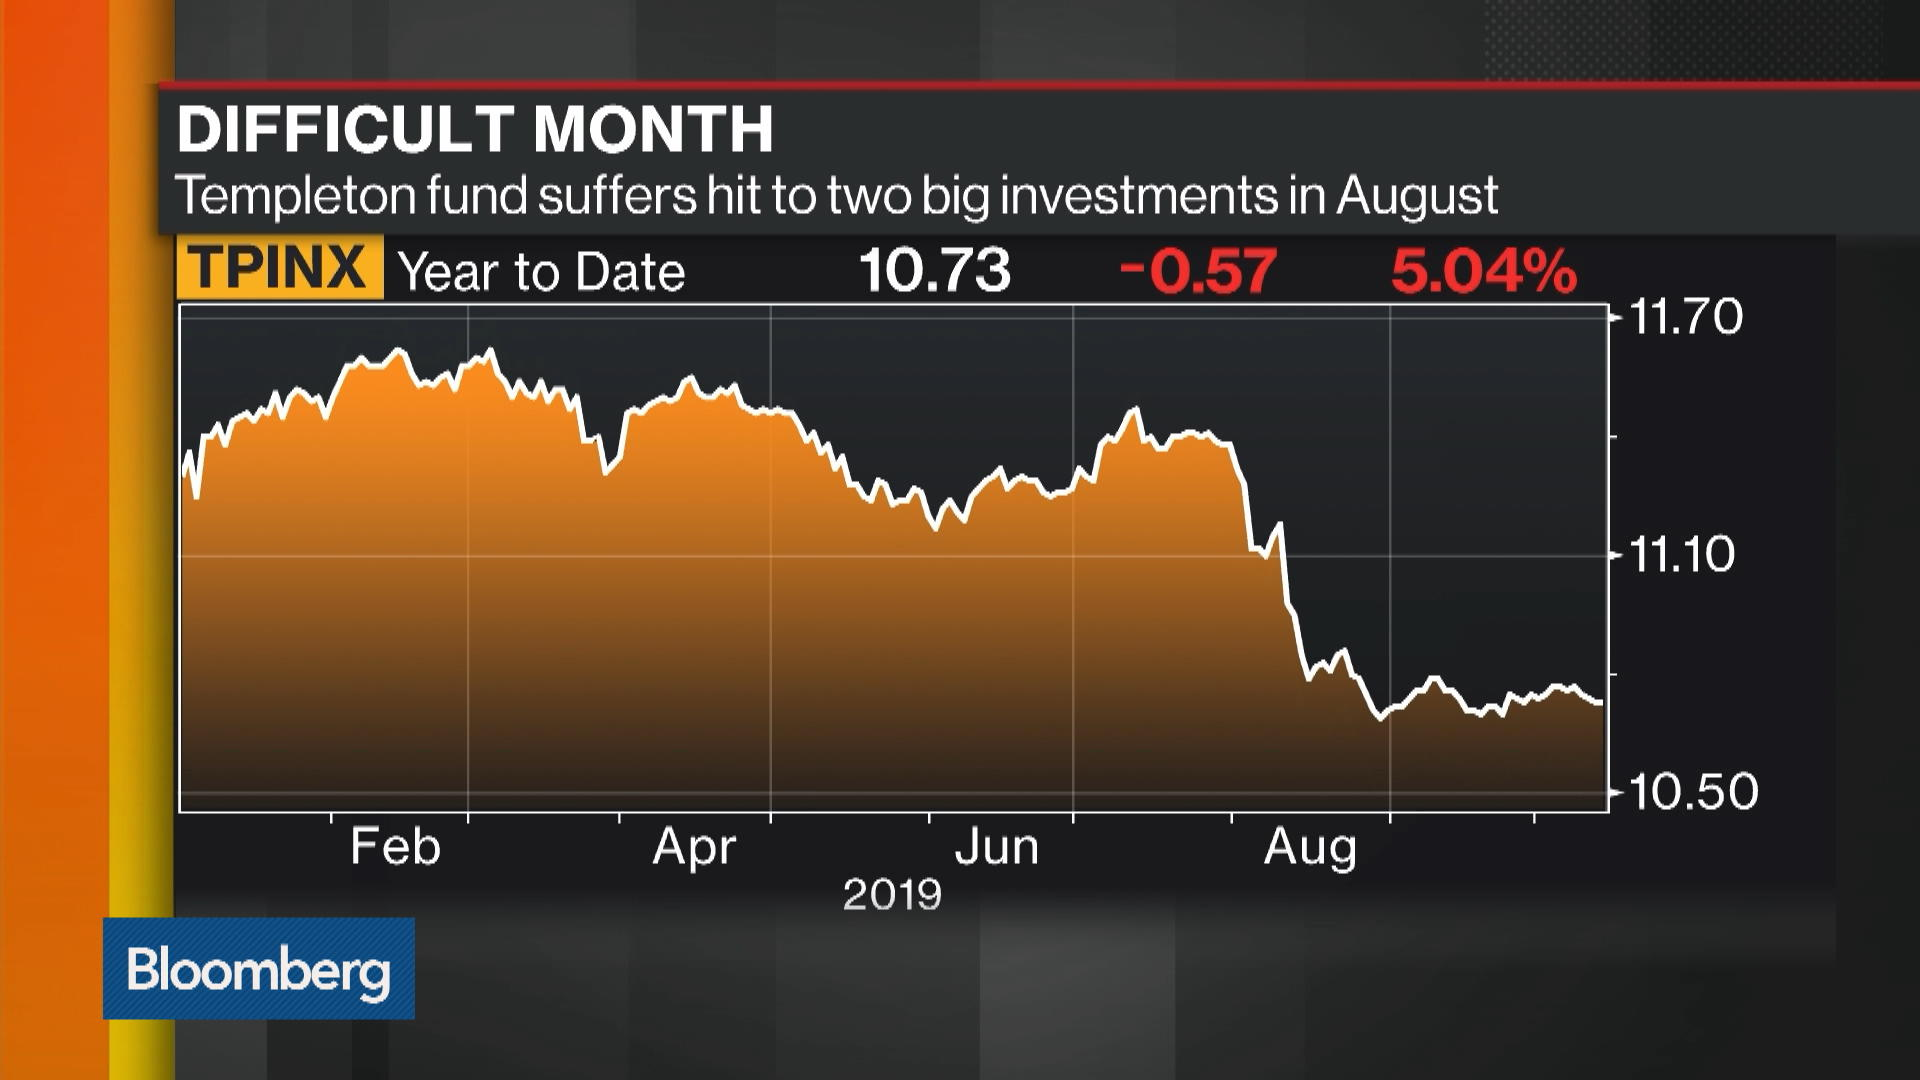 Hasenstab Fund Loses $3 Billion in Rocky Quarter